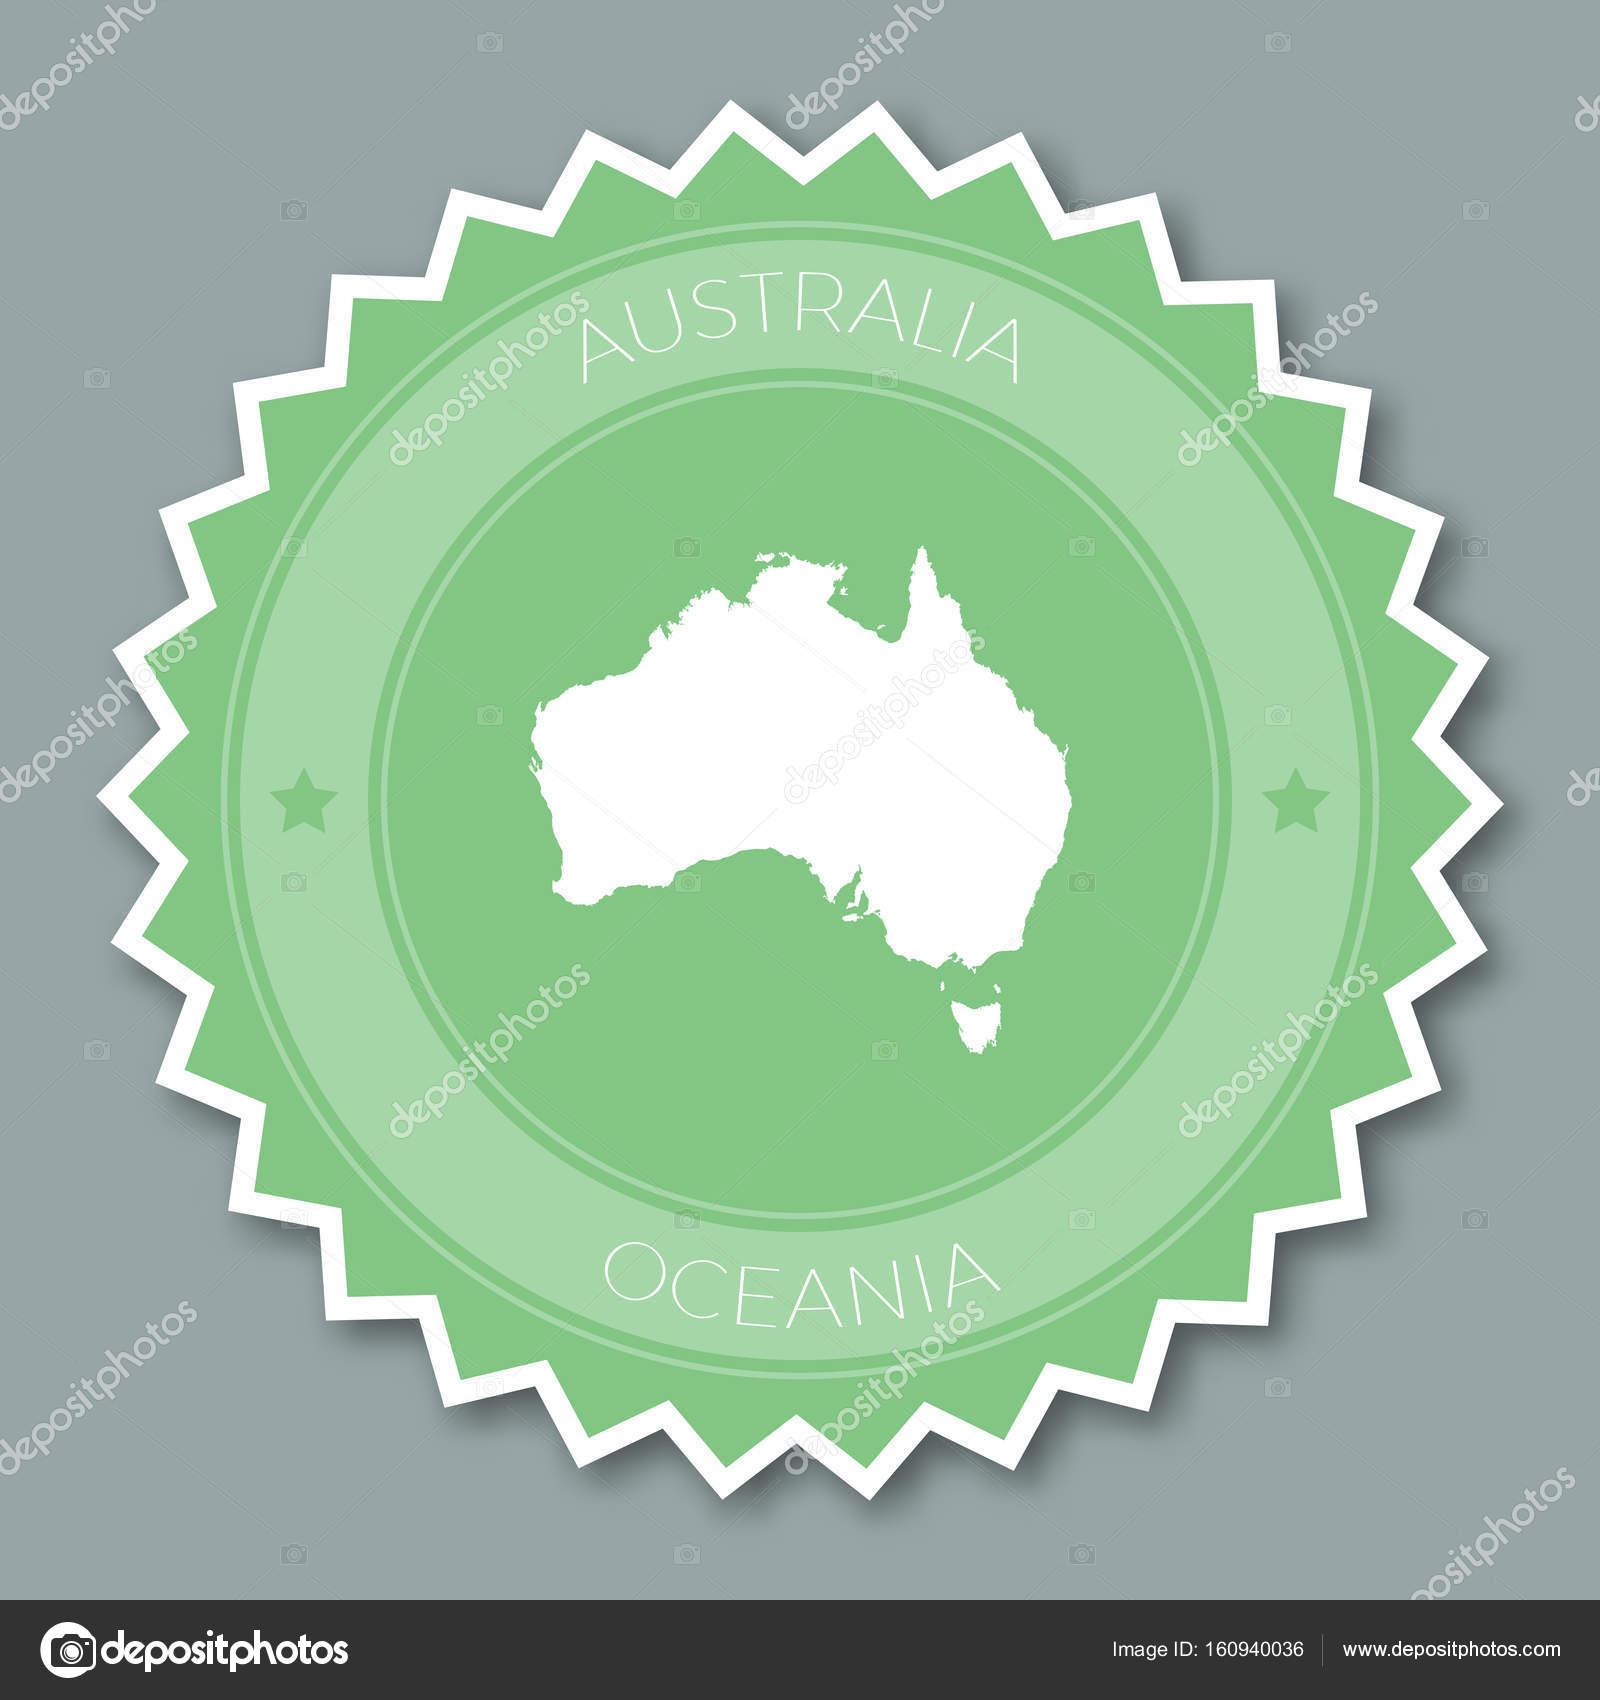 Australien Karta Lander.Australien Badge Platt Design Runda Platta Stil Klistermarke Av